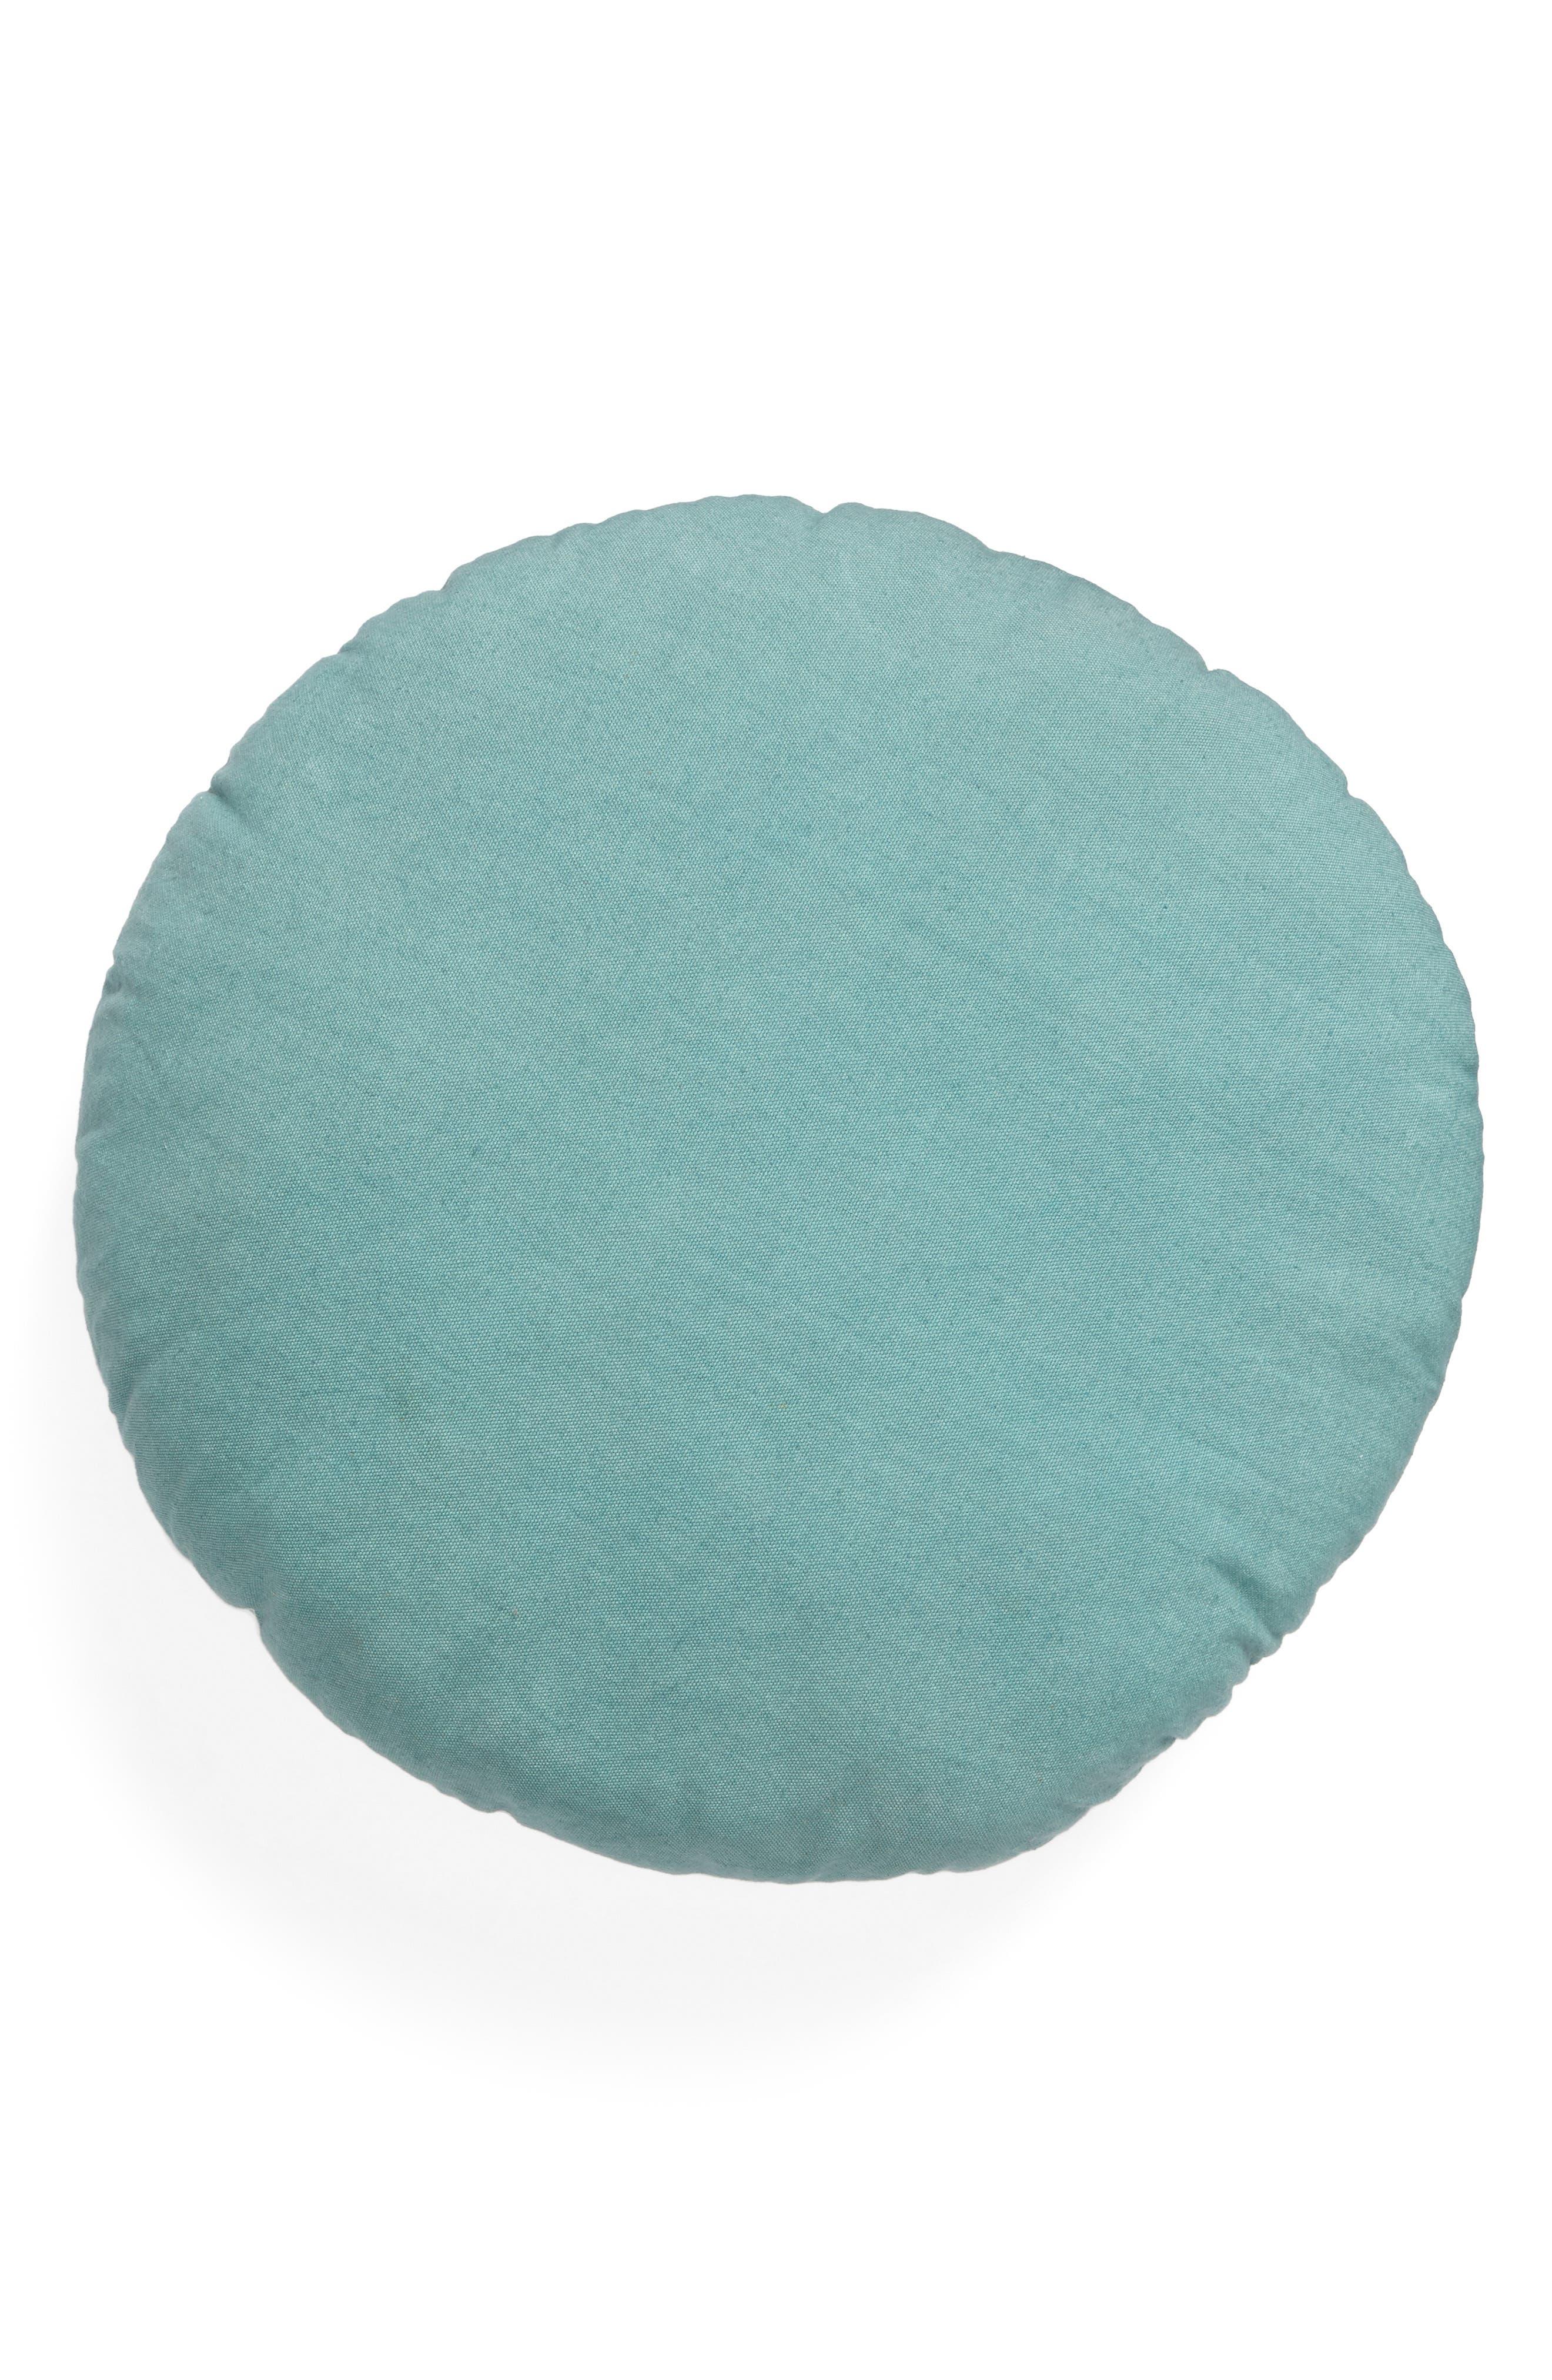 Eva Accent Pillow,                             Alternate thumbnail 2, color,                             Teal Aquifer